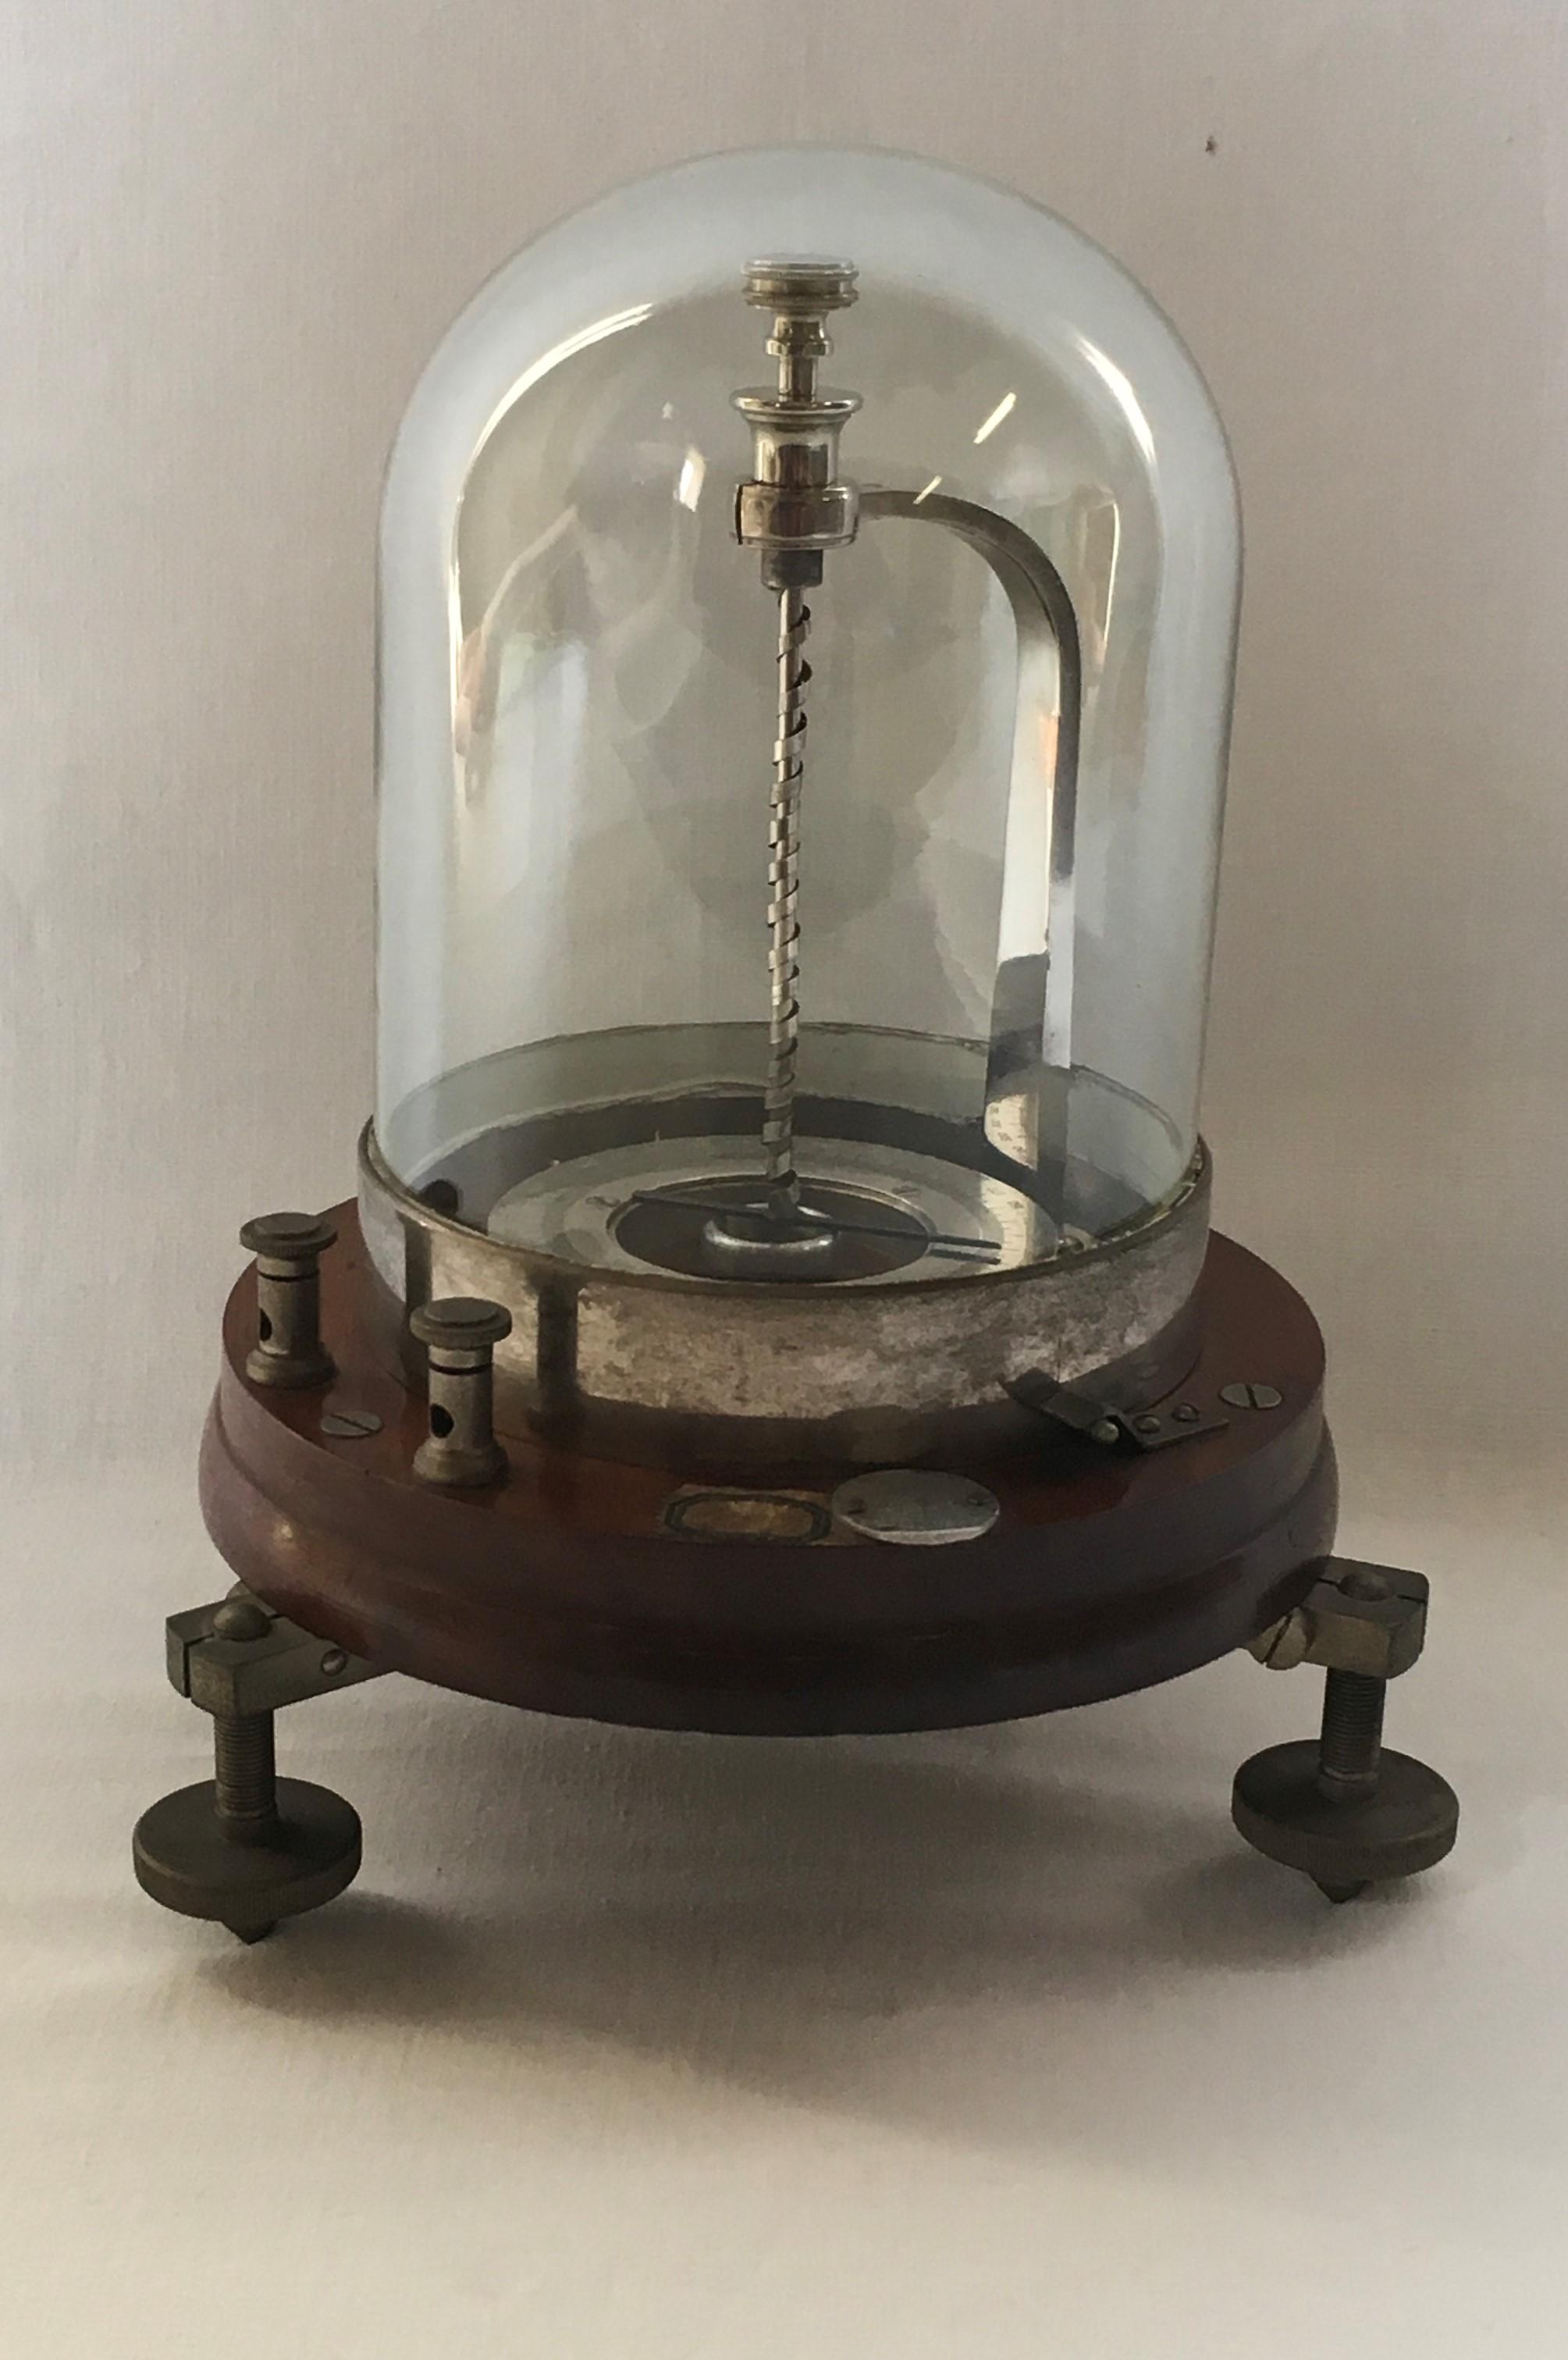 Termometro metallico di Breguet